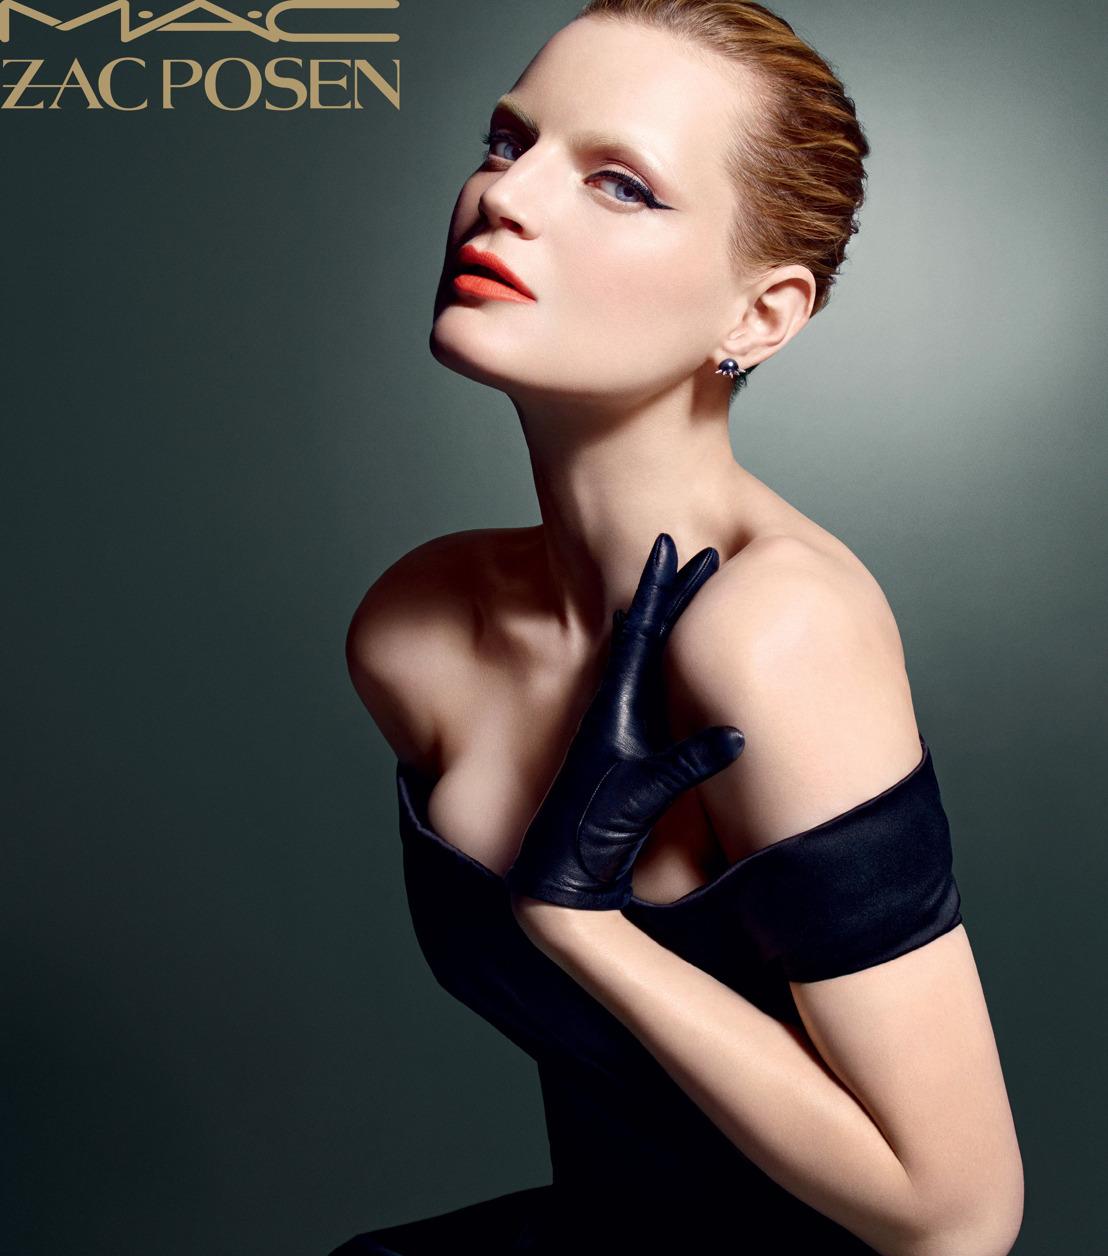 M.A.C Cosmetics announces #MACZacPosen